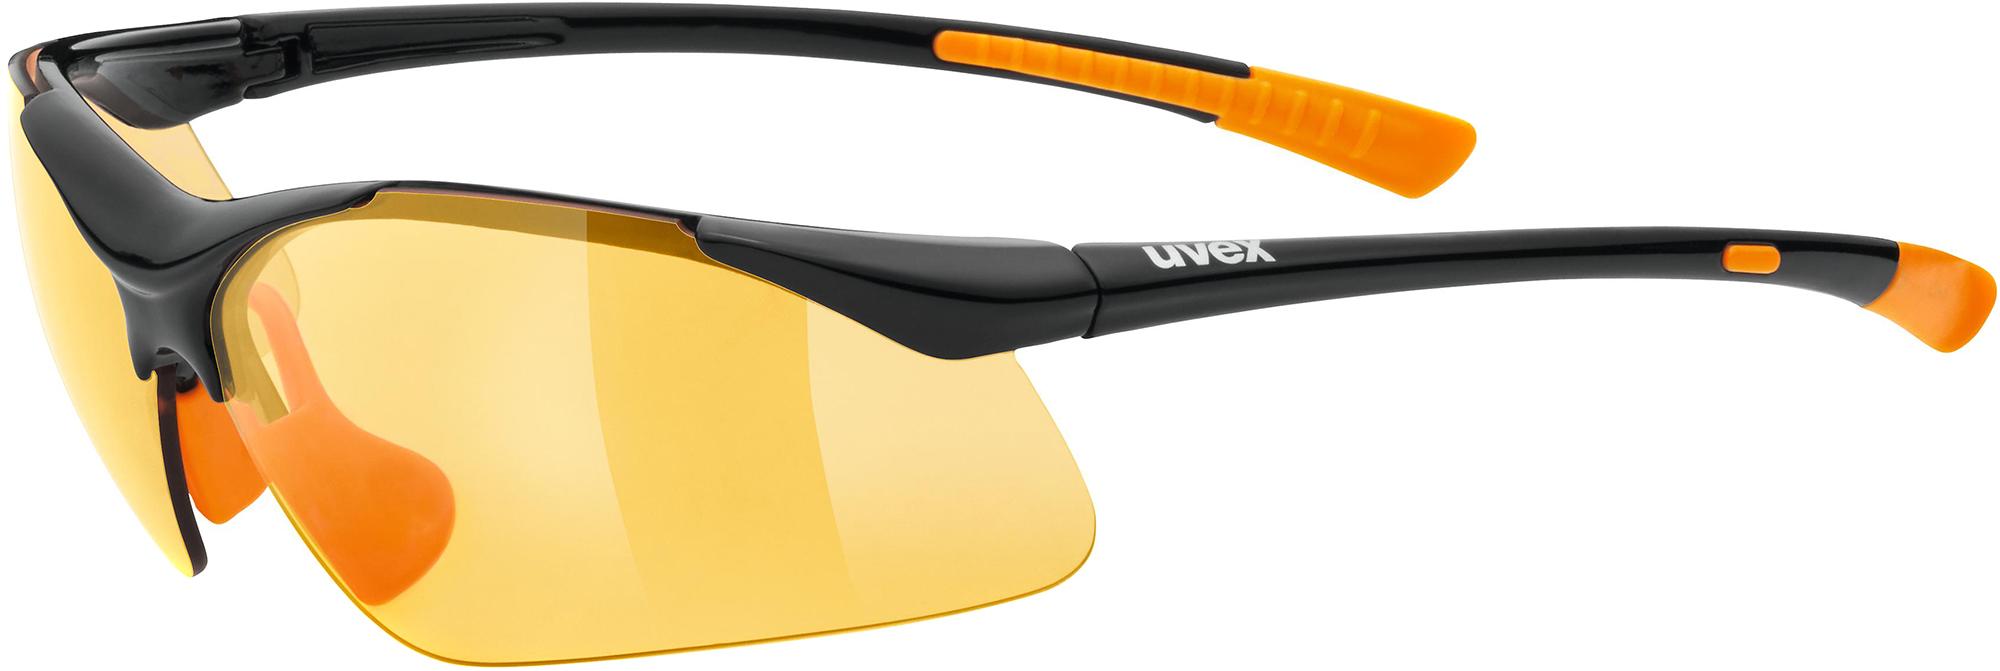 Uvex Солнцезащитные очки Sportstyle 223